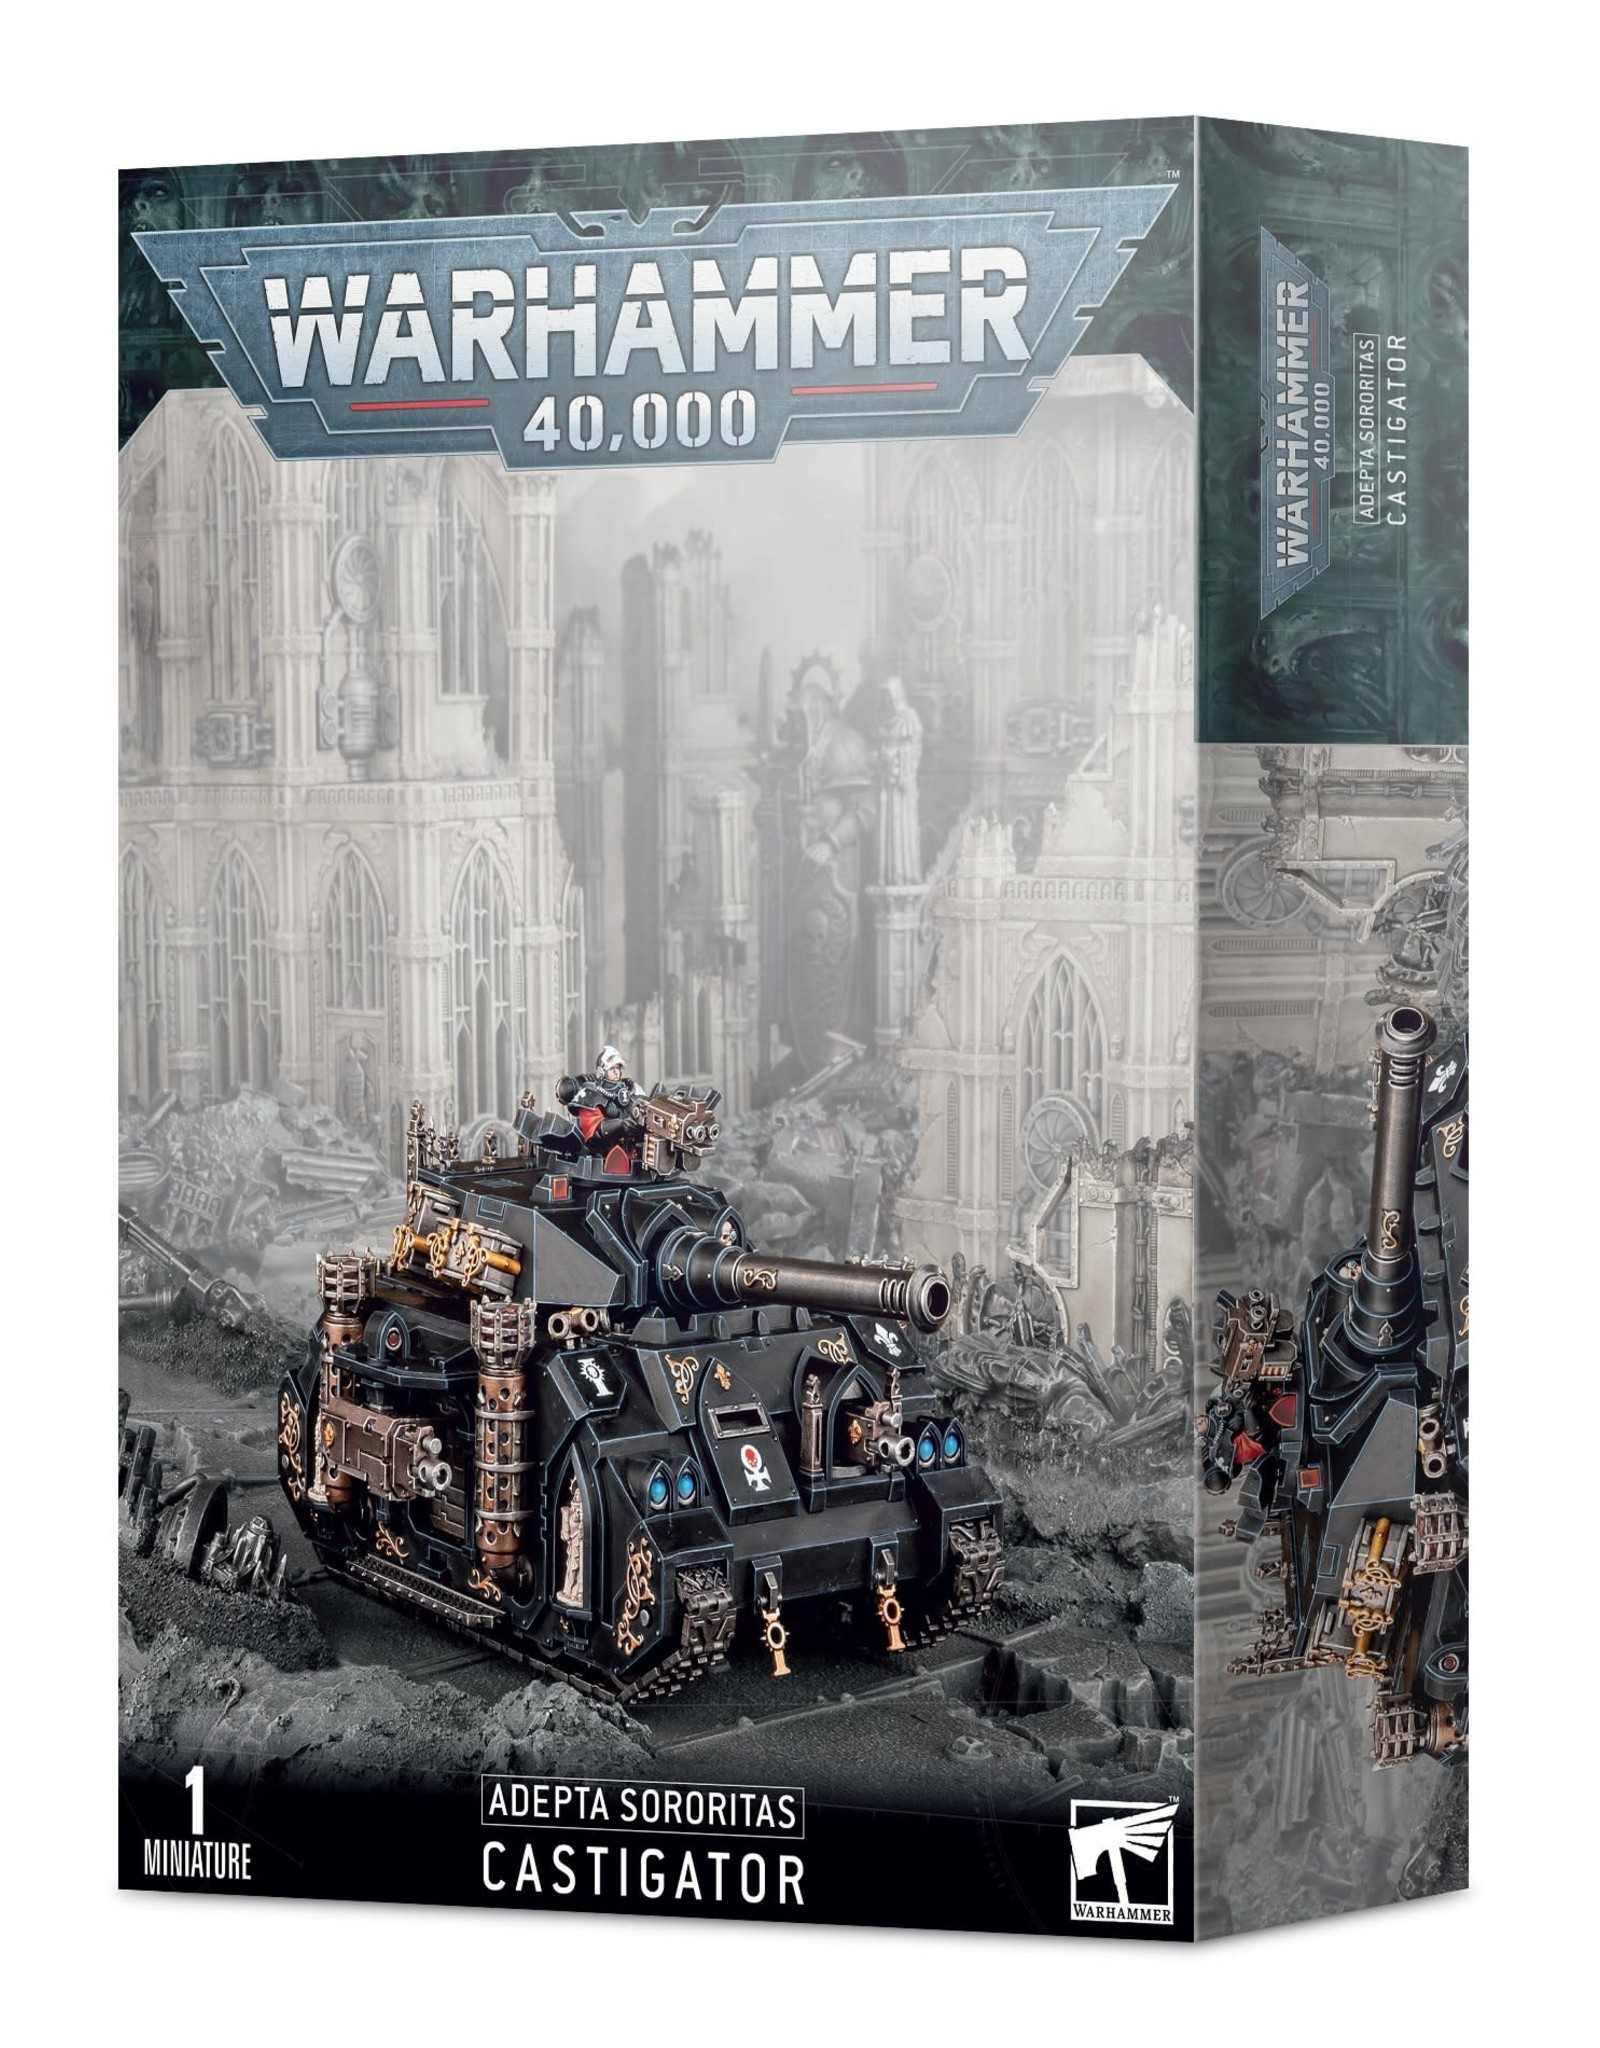 Games Workshop Warhammer 40K: Adeptas Sororitas Castigator